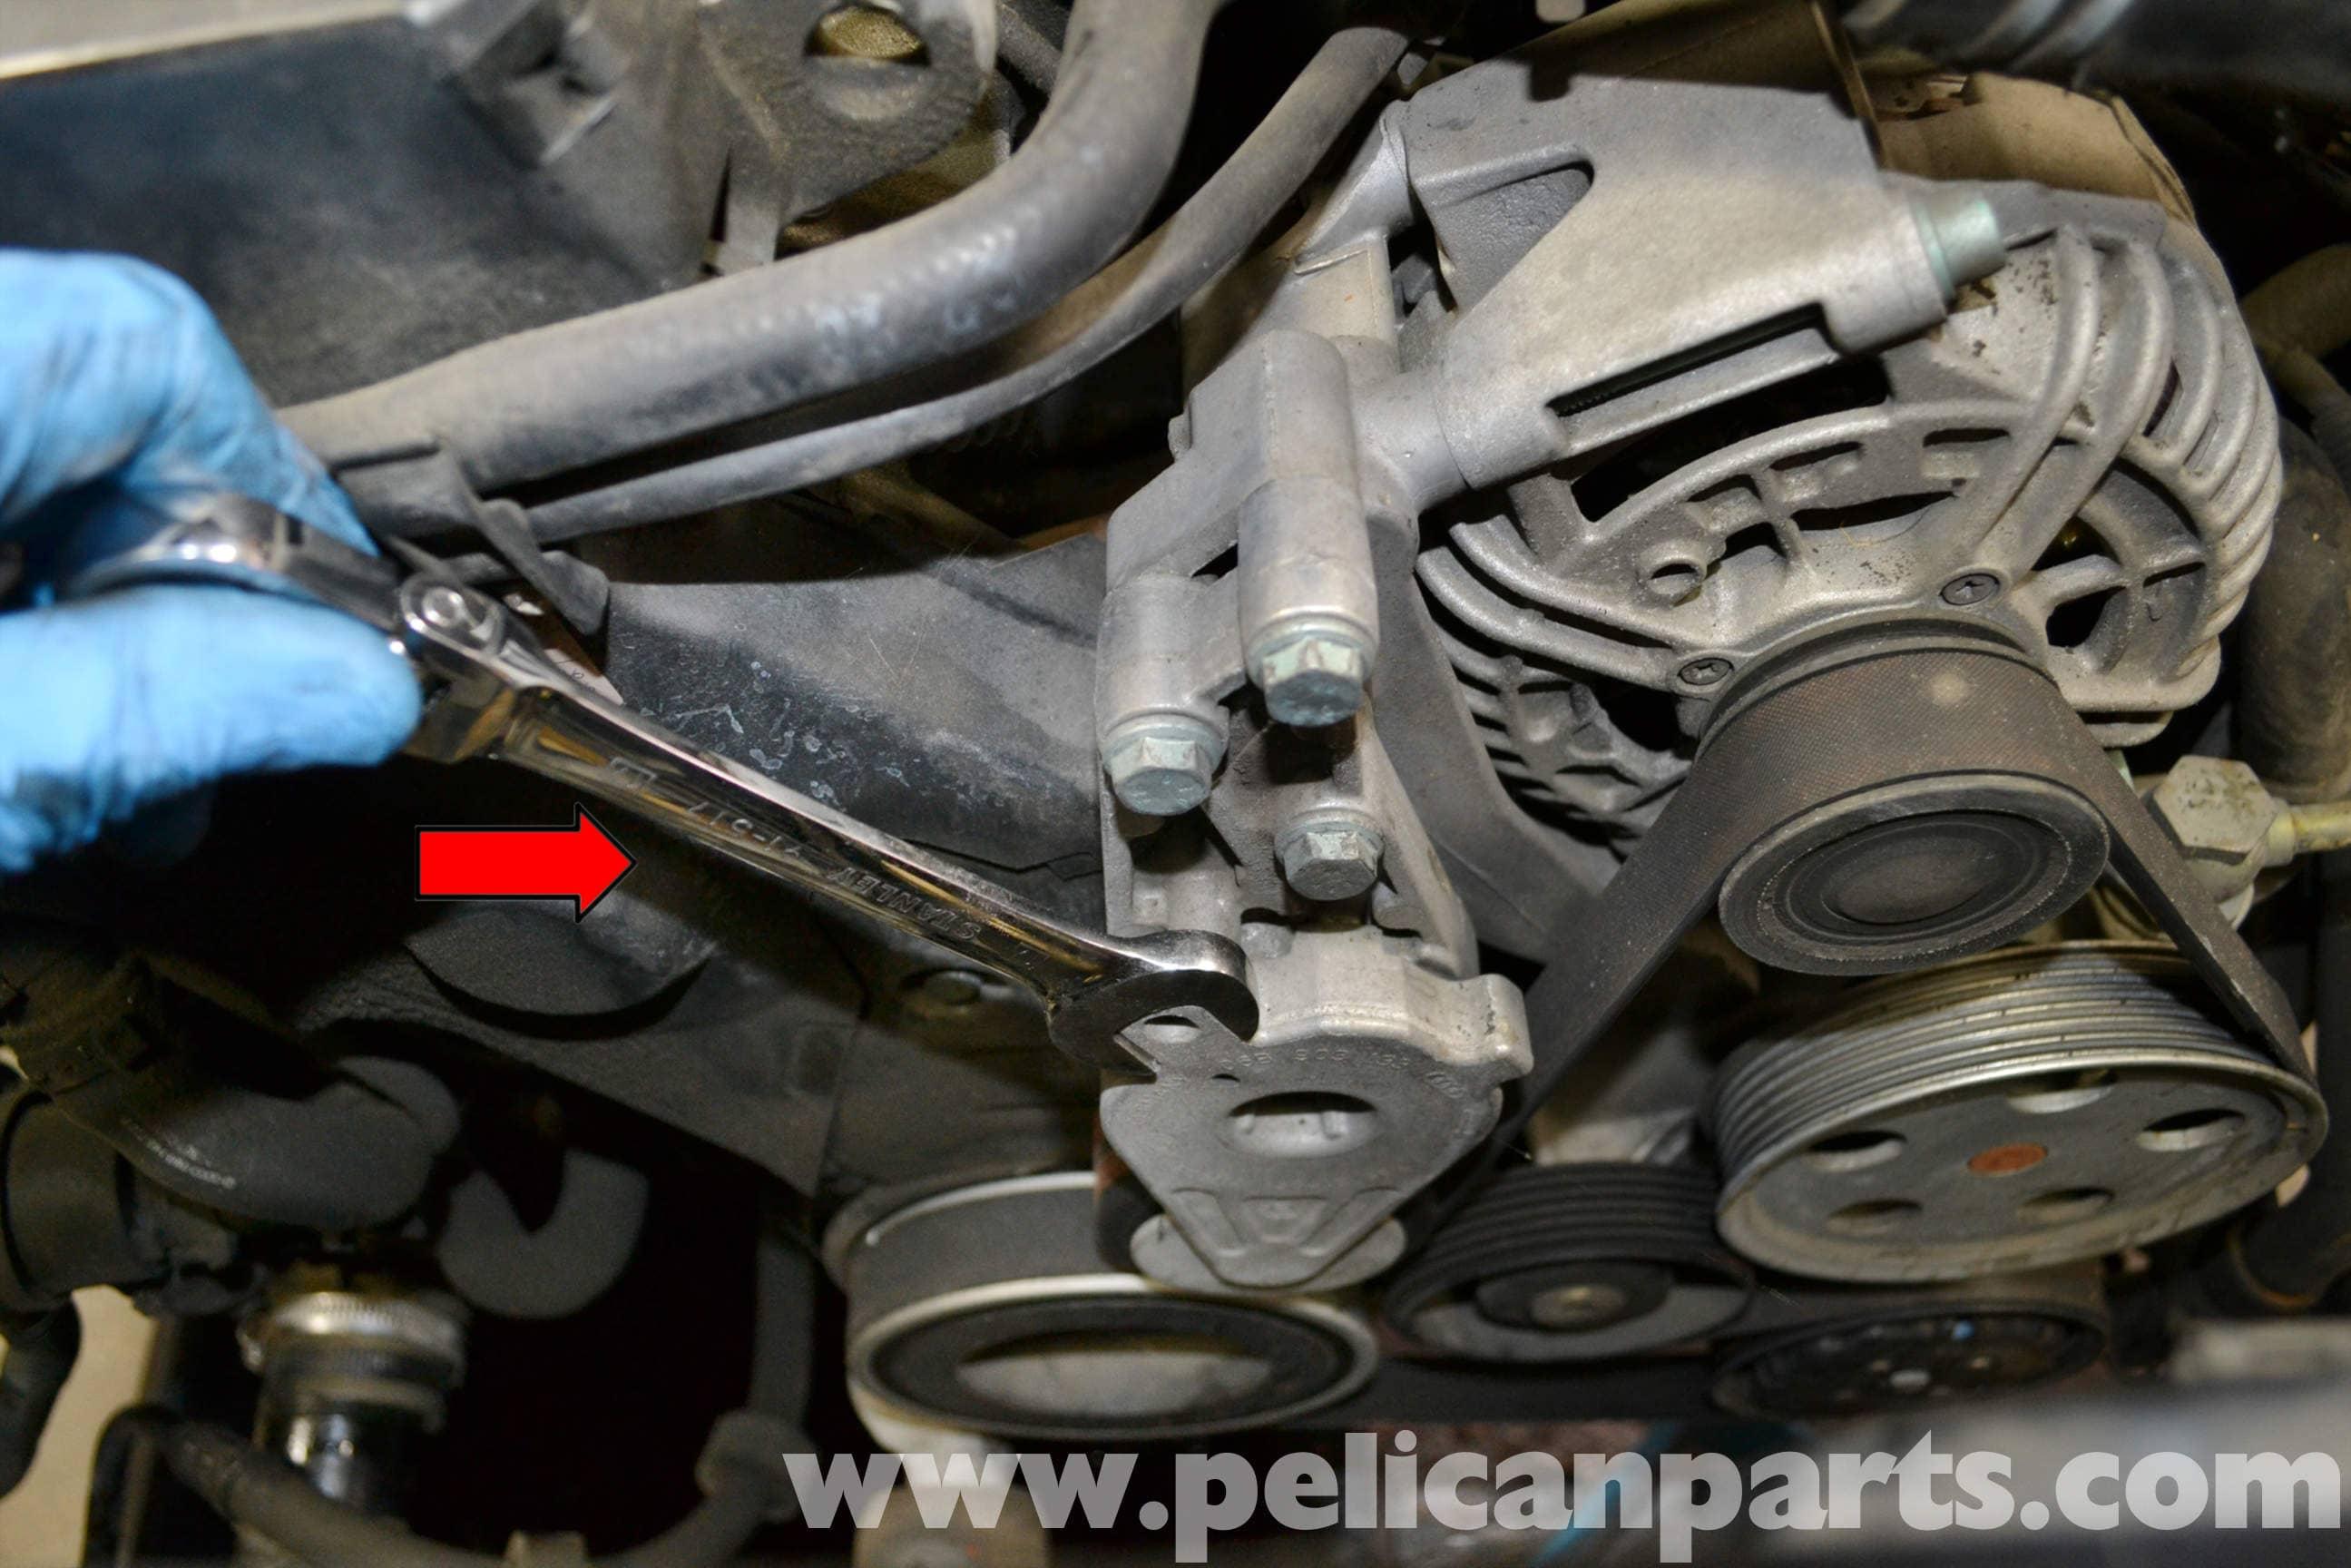 Audi A4 B6 Accessory Belt Tensioner Replacement 2002 2008